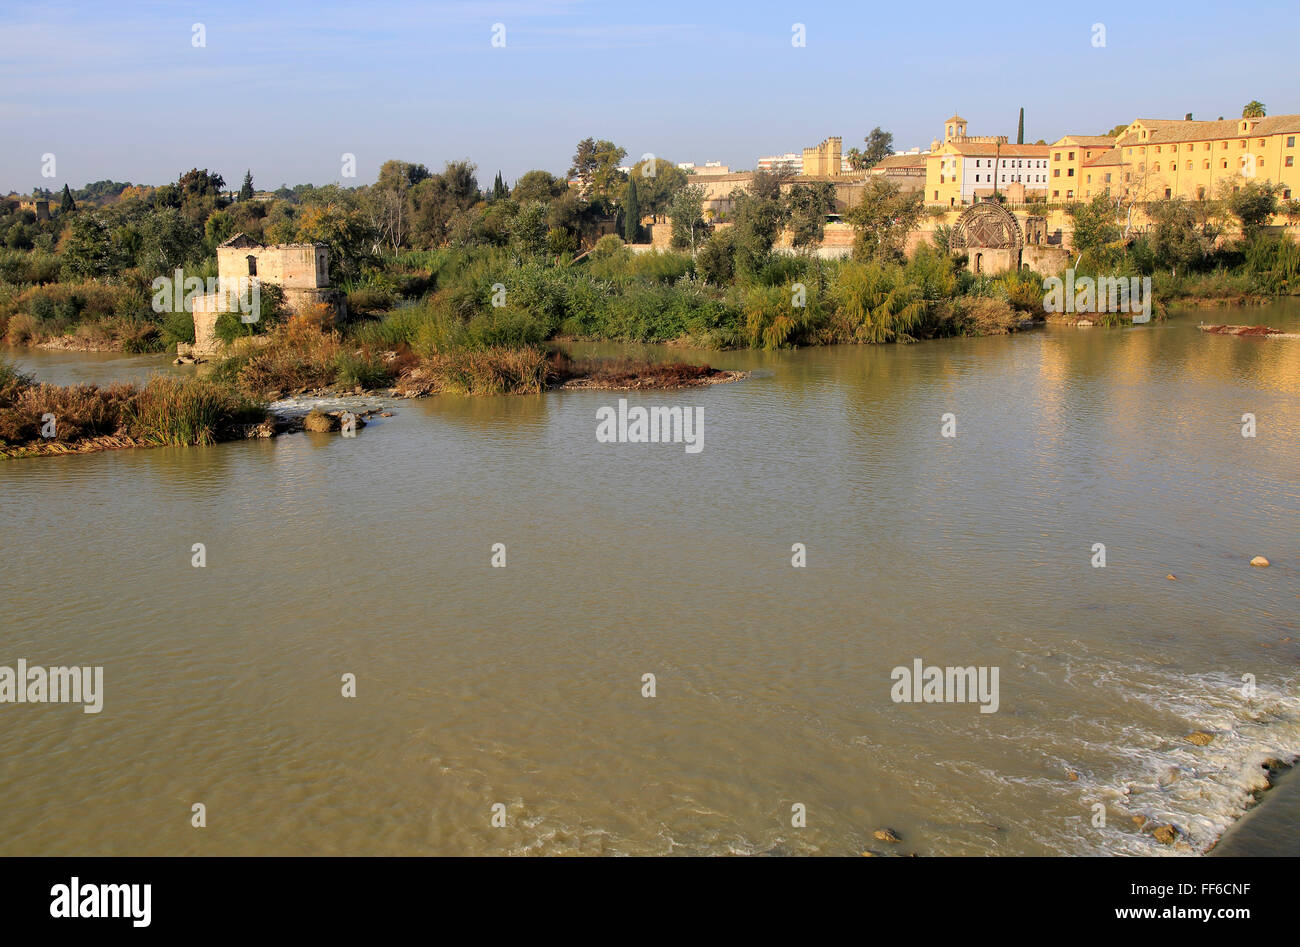 Historic Albolafia Moorish water-wheel on river Rio Guadalquivir, Cordoba, Spain - Stock Image